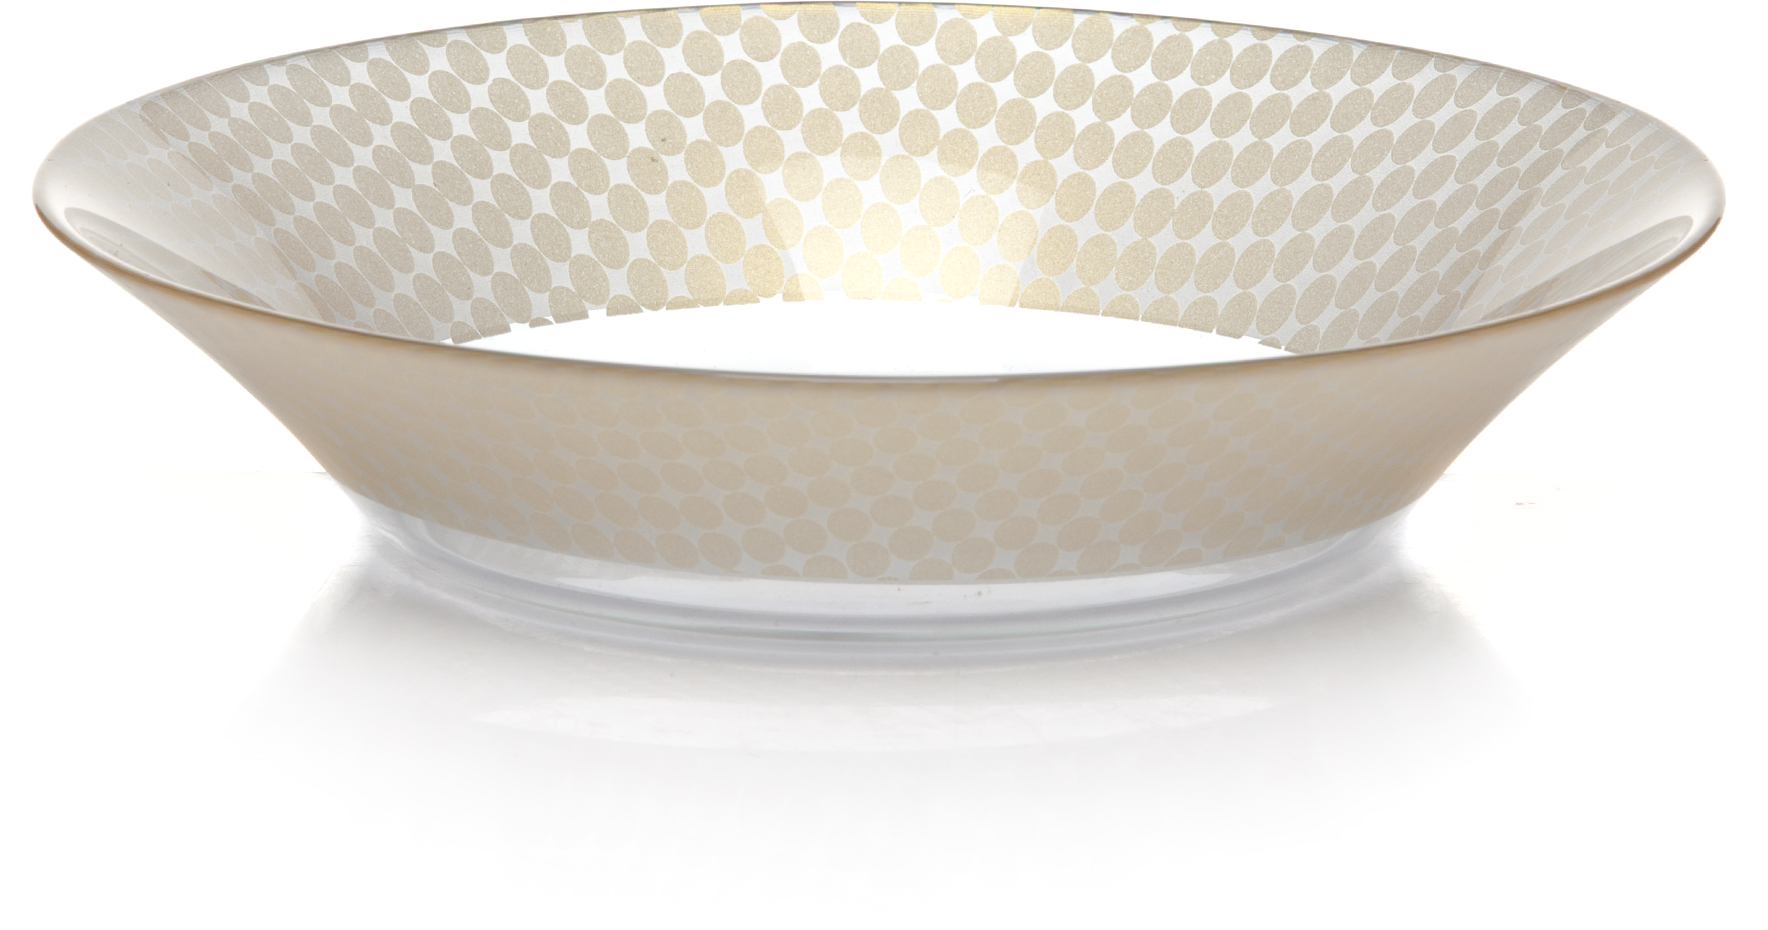 Тарелка глубокая Pasabahce Шарм, цвет: золотой, диаметр 22 см. 10335SLBD5010335SLBD50Тарелка глубокая d=220 мм, 220*220*45 мм